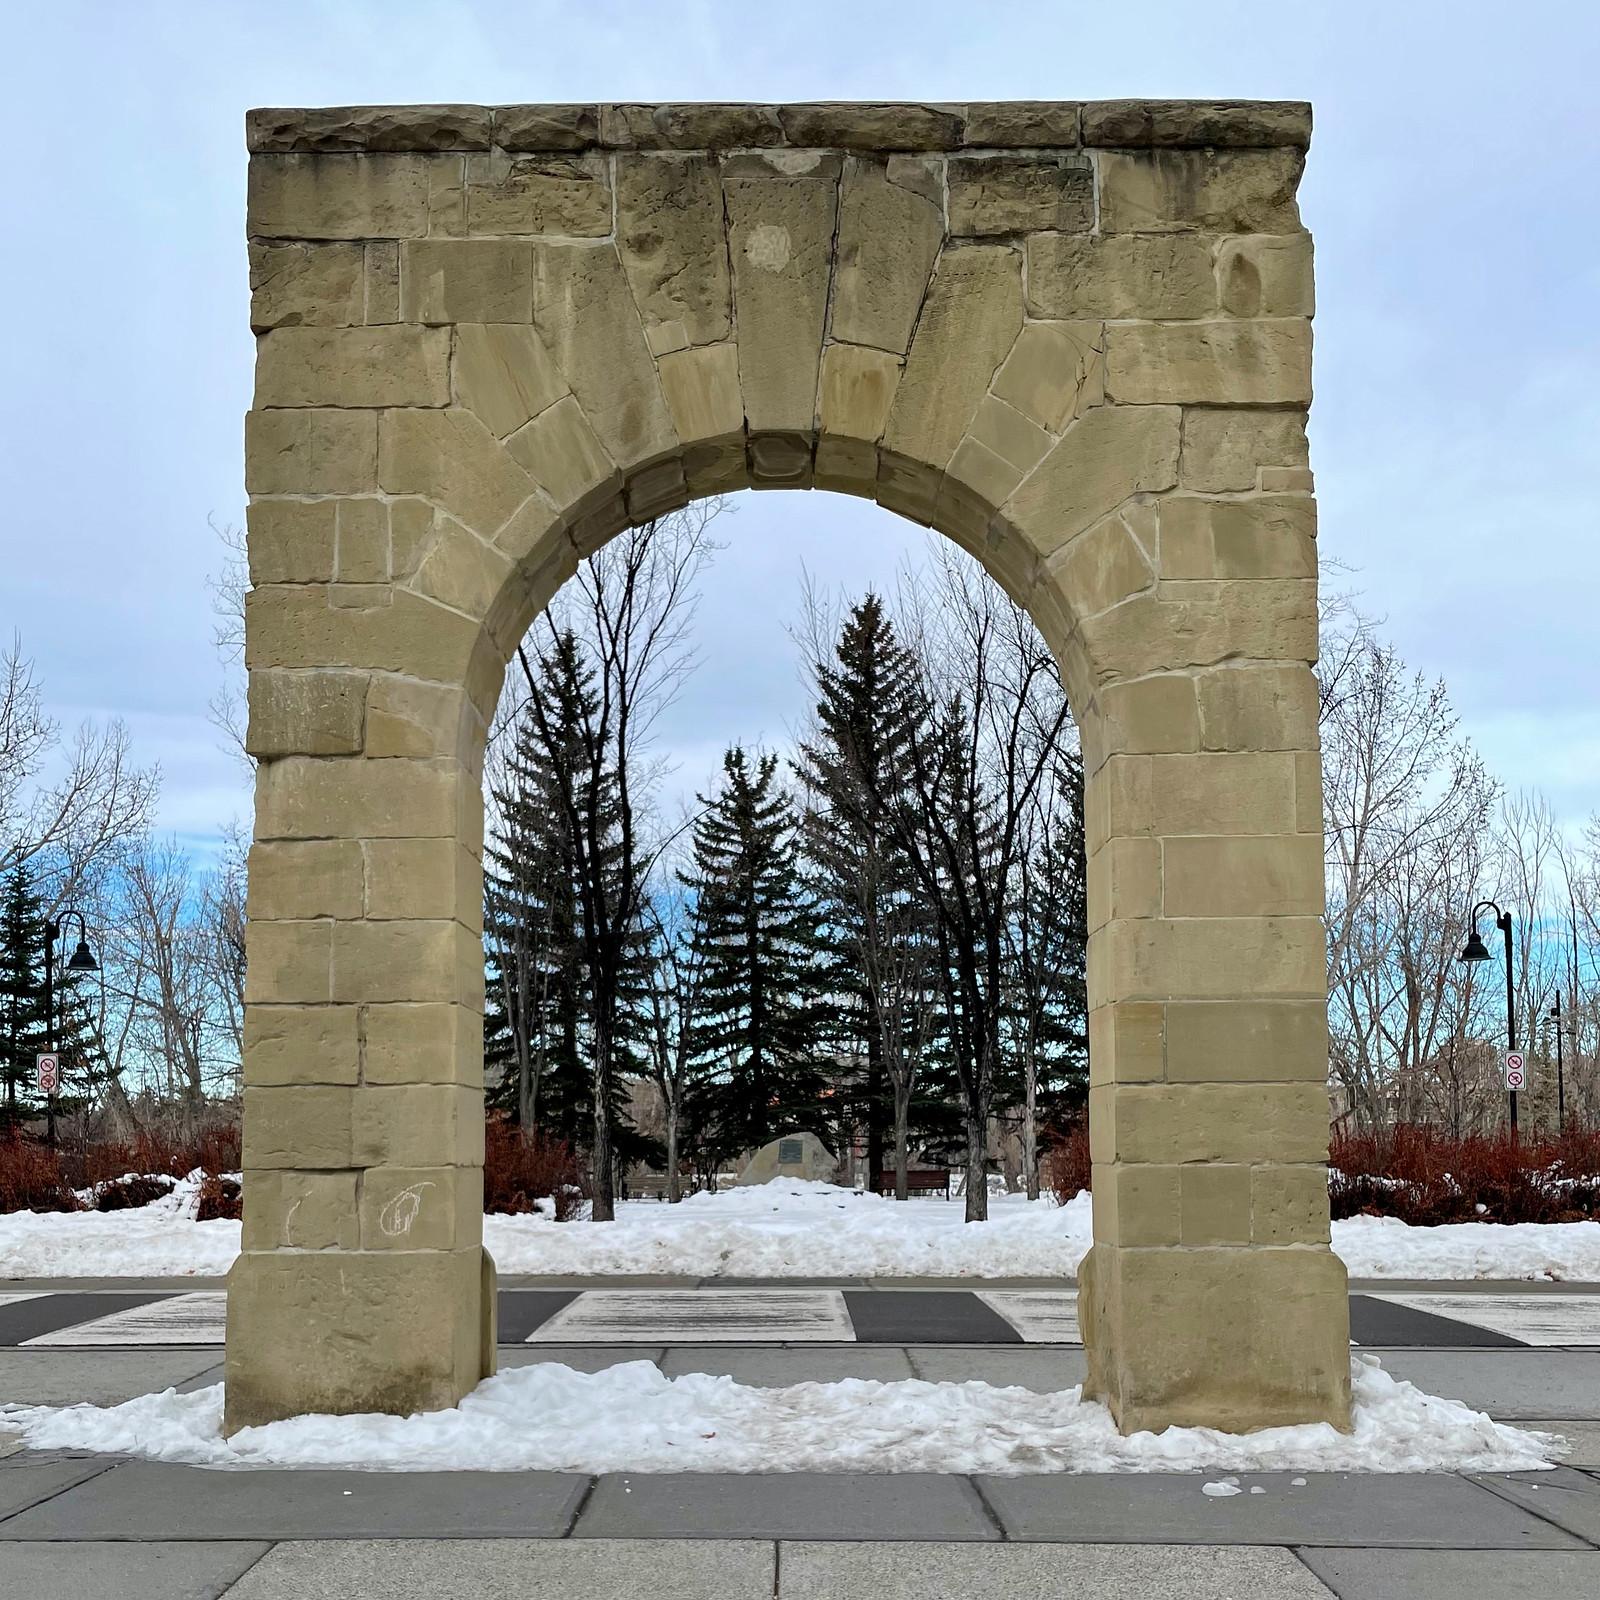 Lone archway